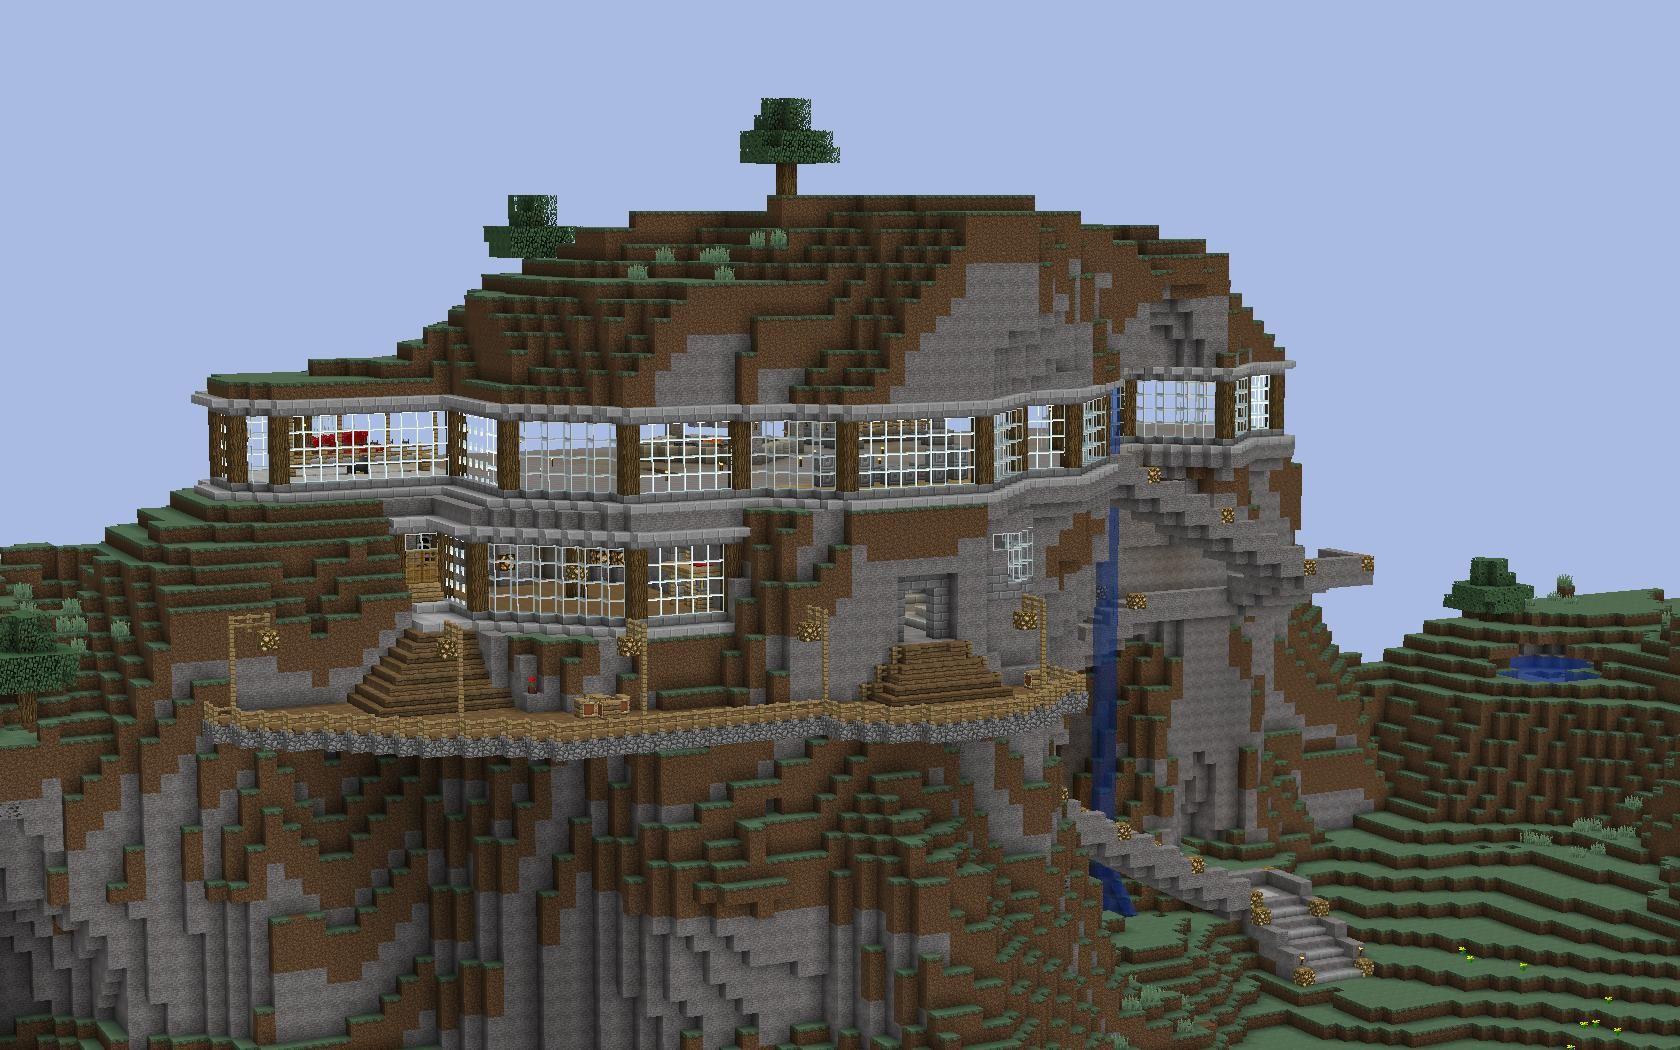 Mountain house minecraft mansion tutorial designs modern also stuff for aidan rh hu pinterest